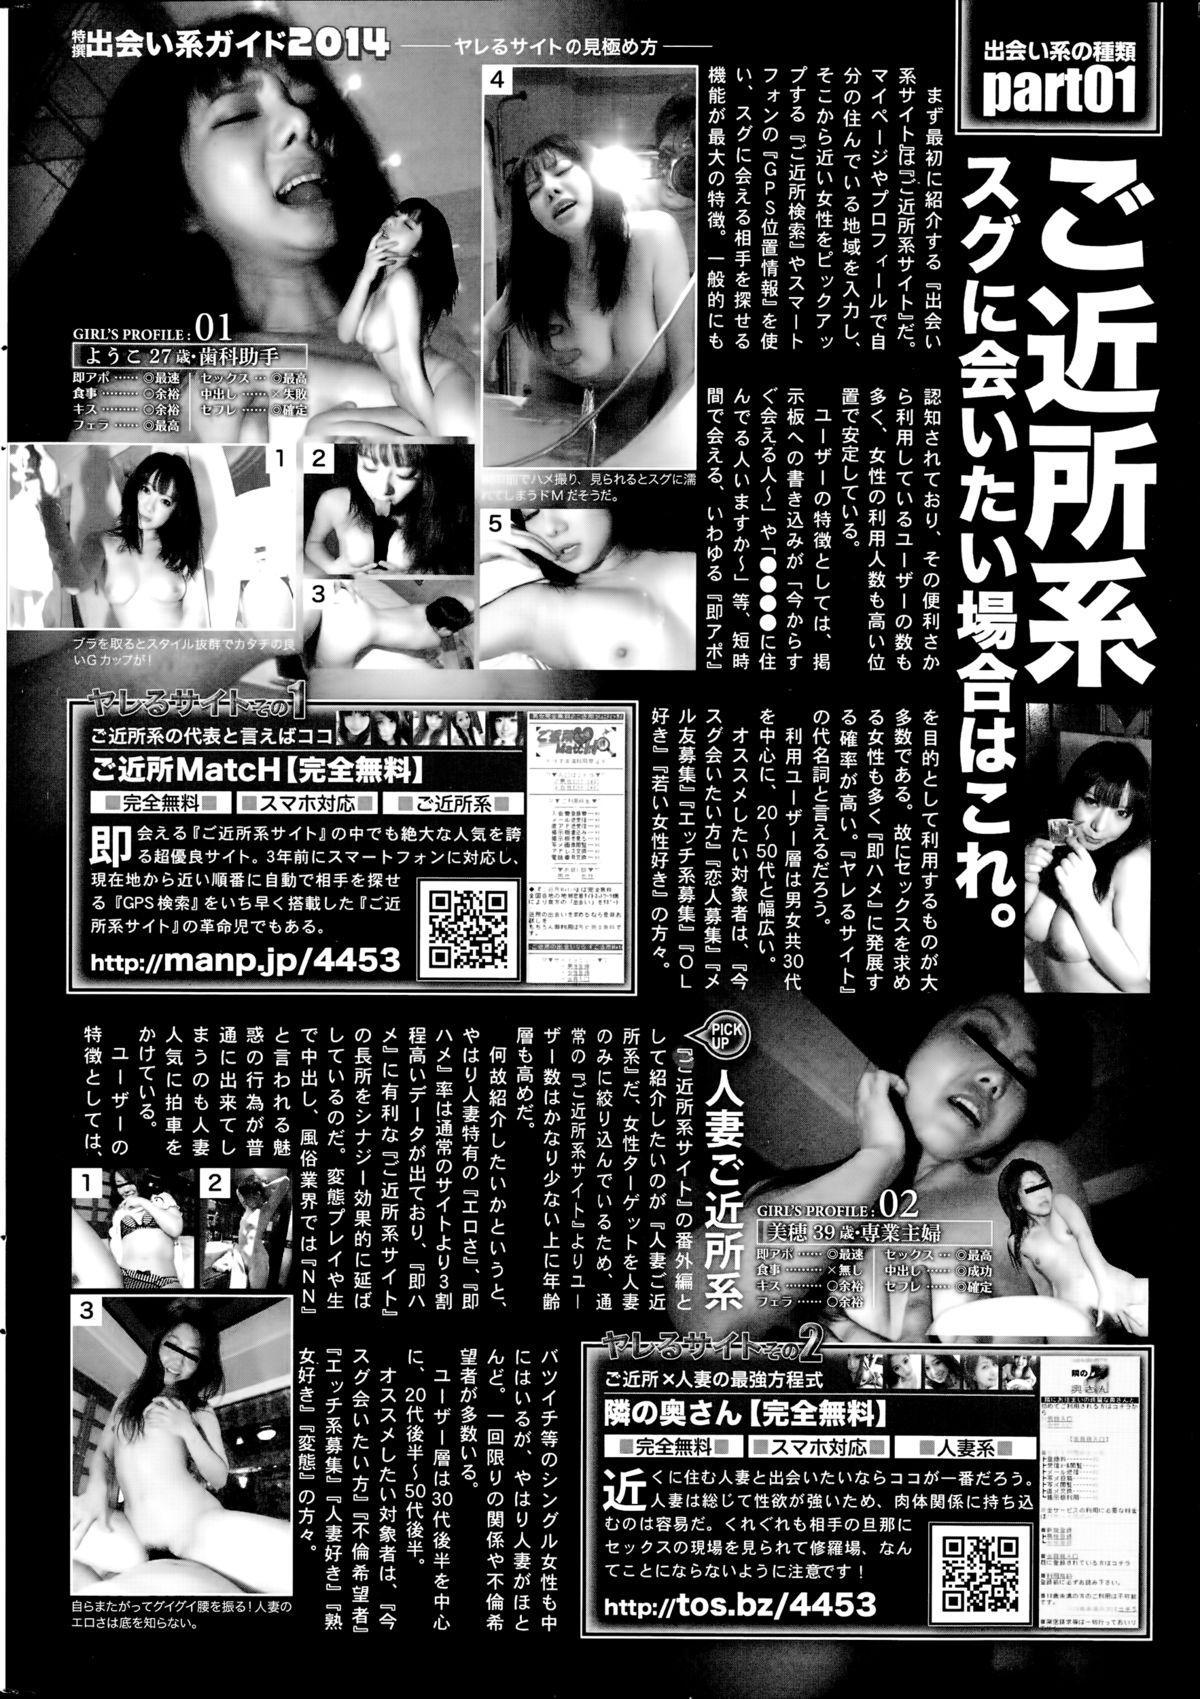 COMIC SIGMA 2014-09 Vol.81 253